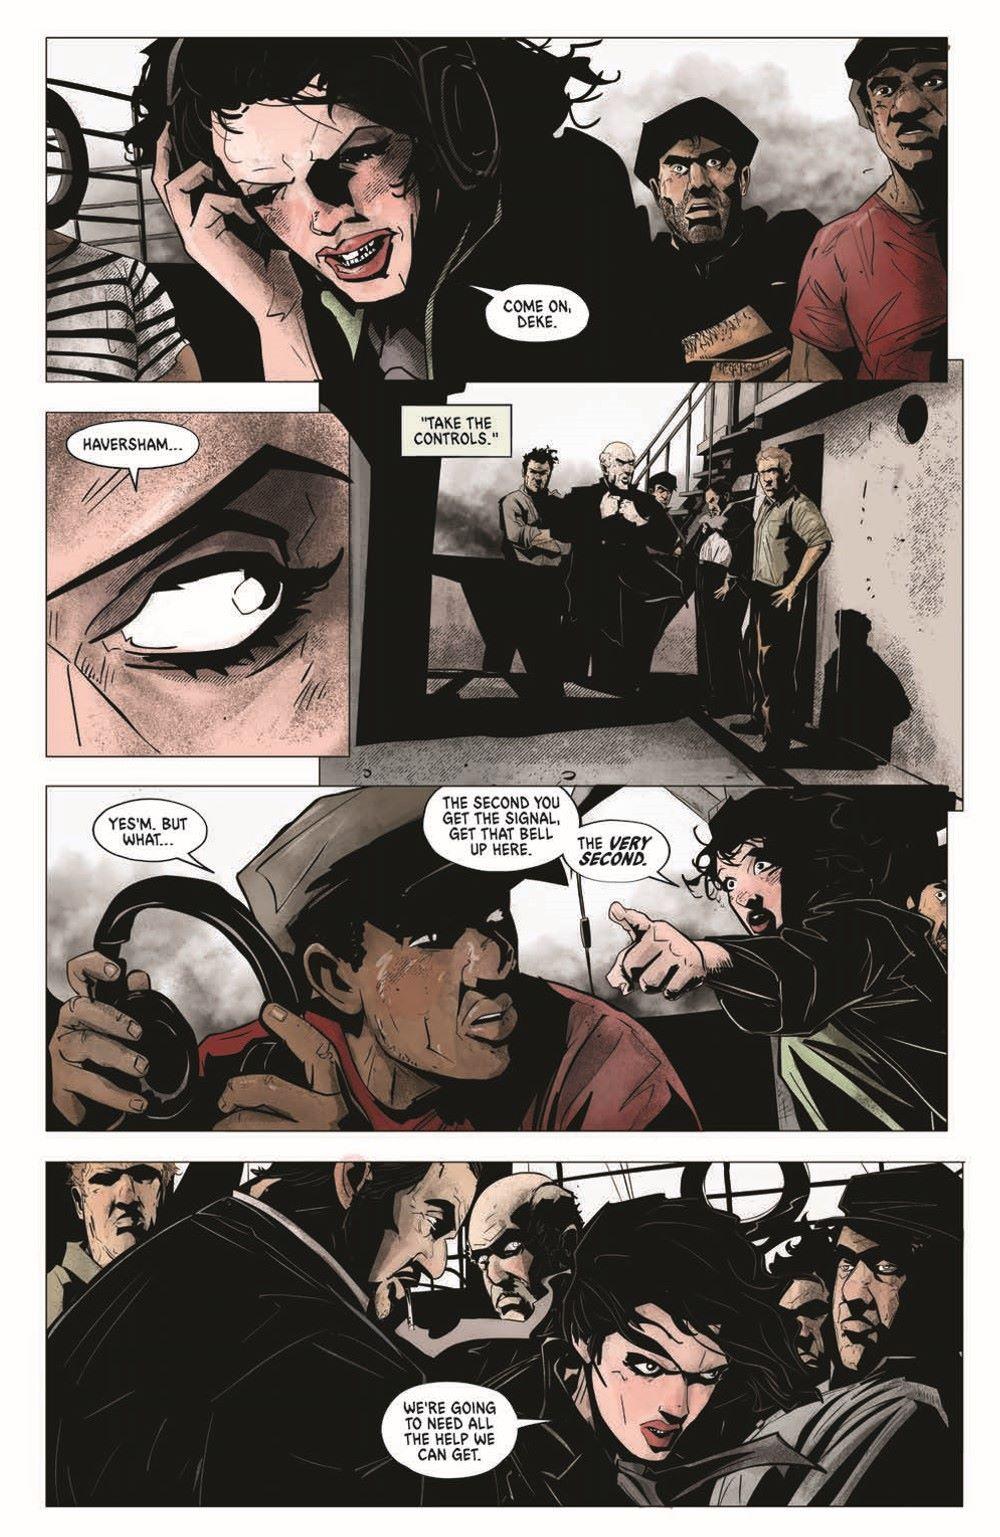 SeaOfSorrow04_pr-7 ComicList Previews: SEA OF SORROWS #4 (OF 5)